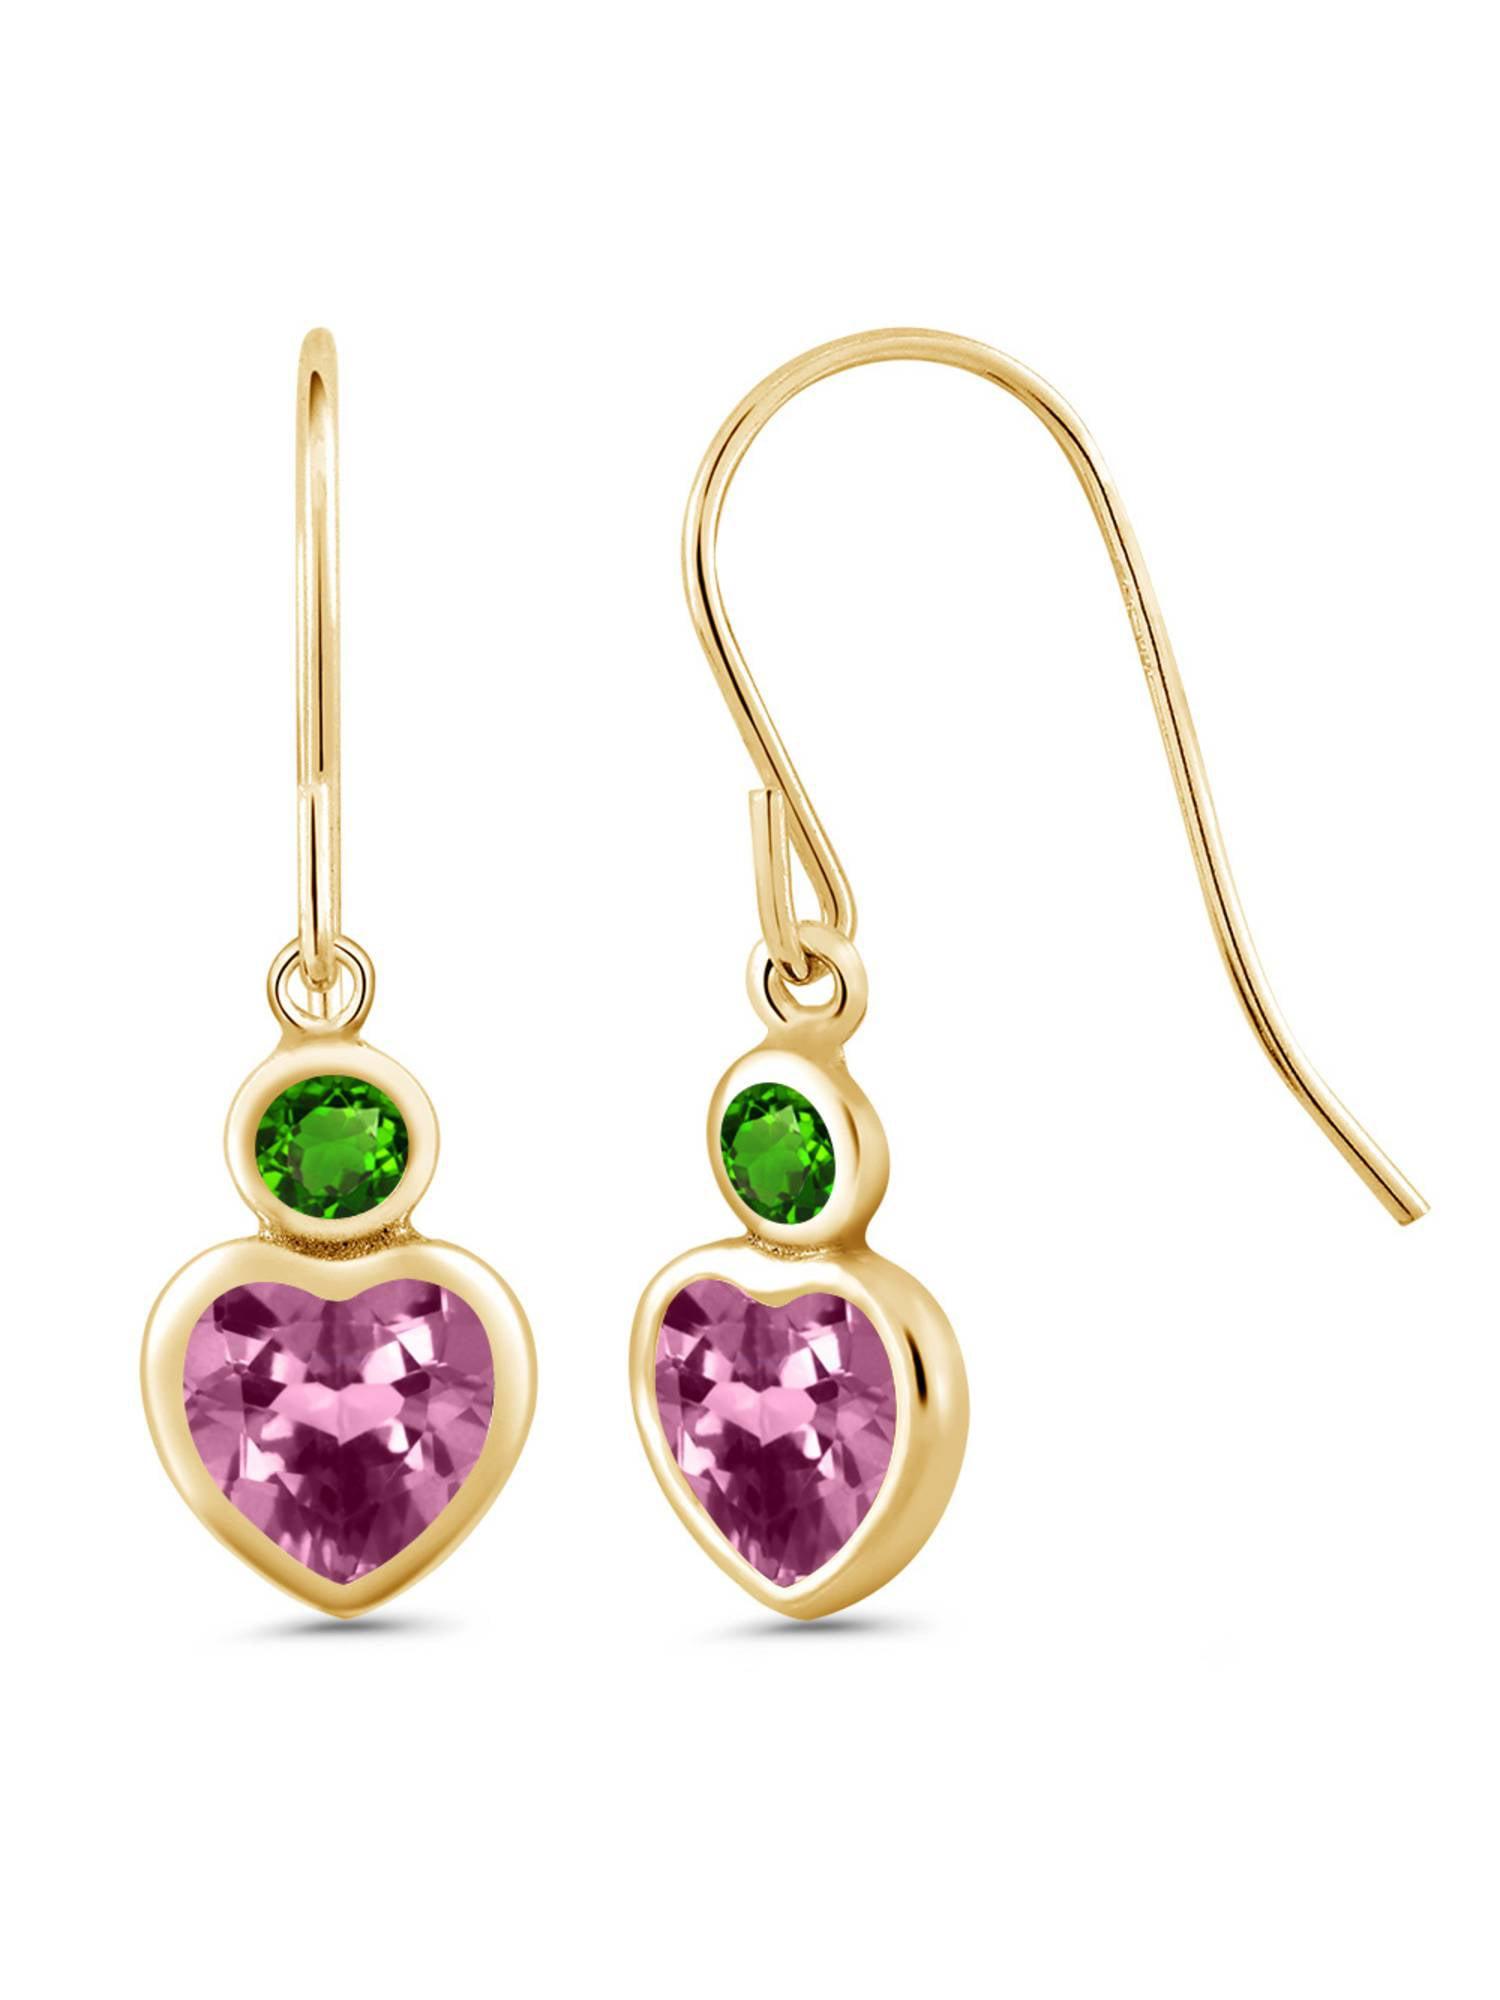 1.16 Ct Pink Tourmaline Green Simulated Tsavorite 14K Yellow Gold Earrings by